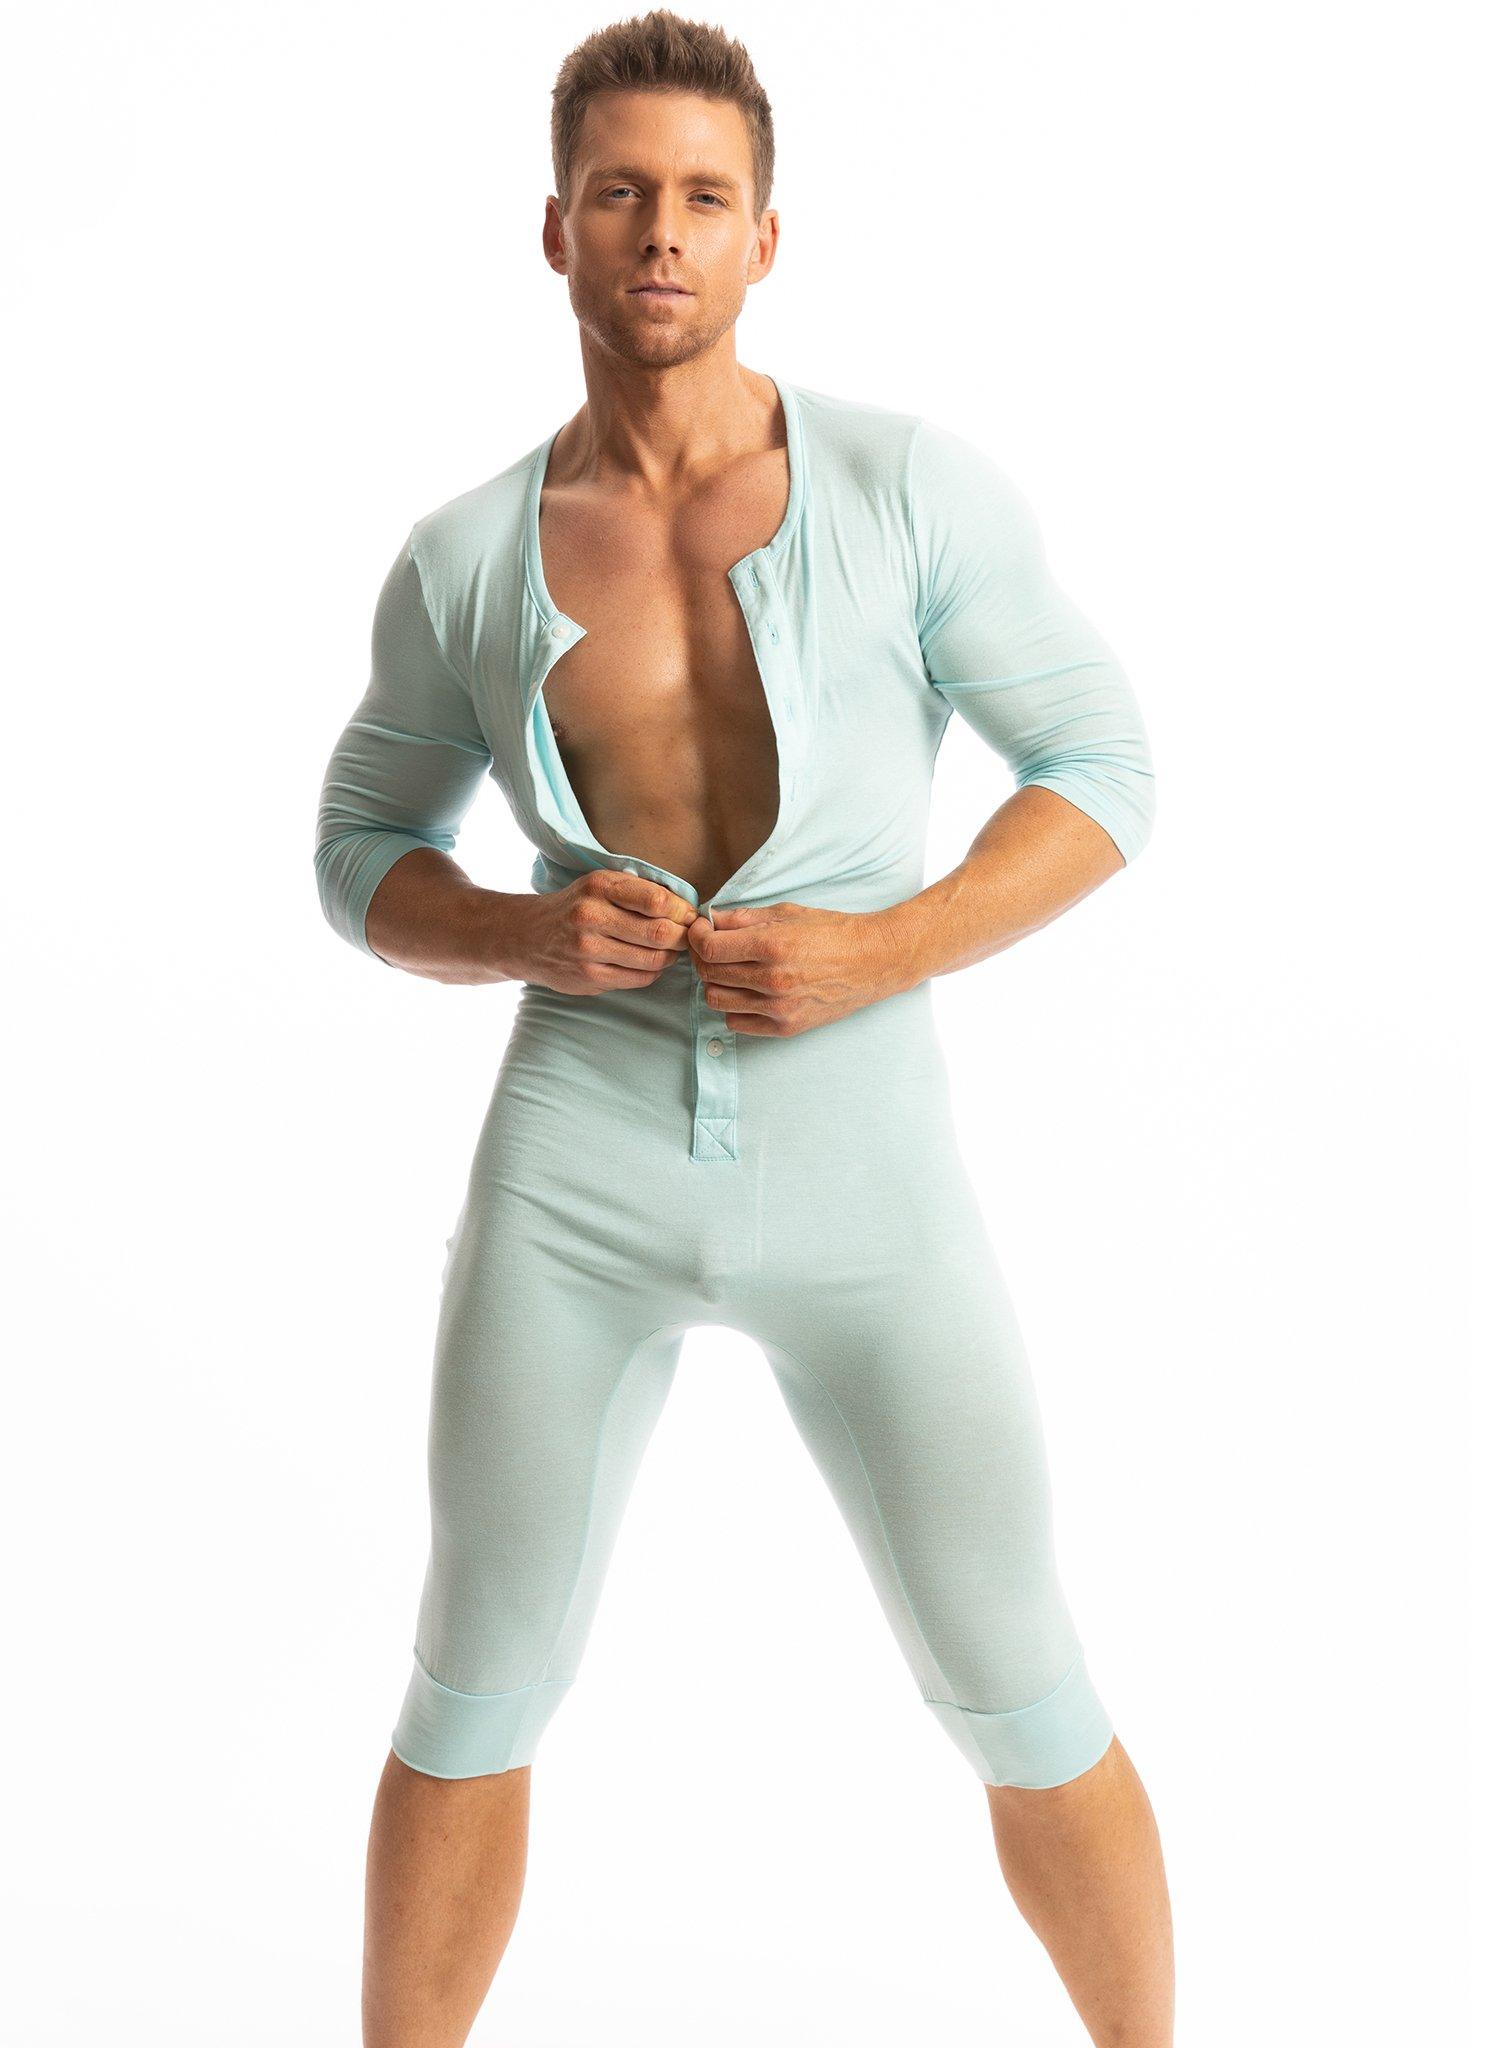 Stay warm in N2N Bodywear's Ice Onesie